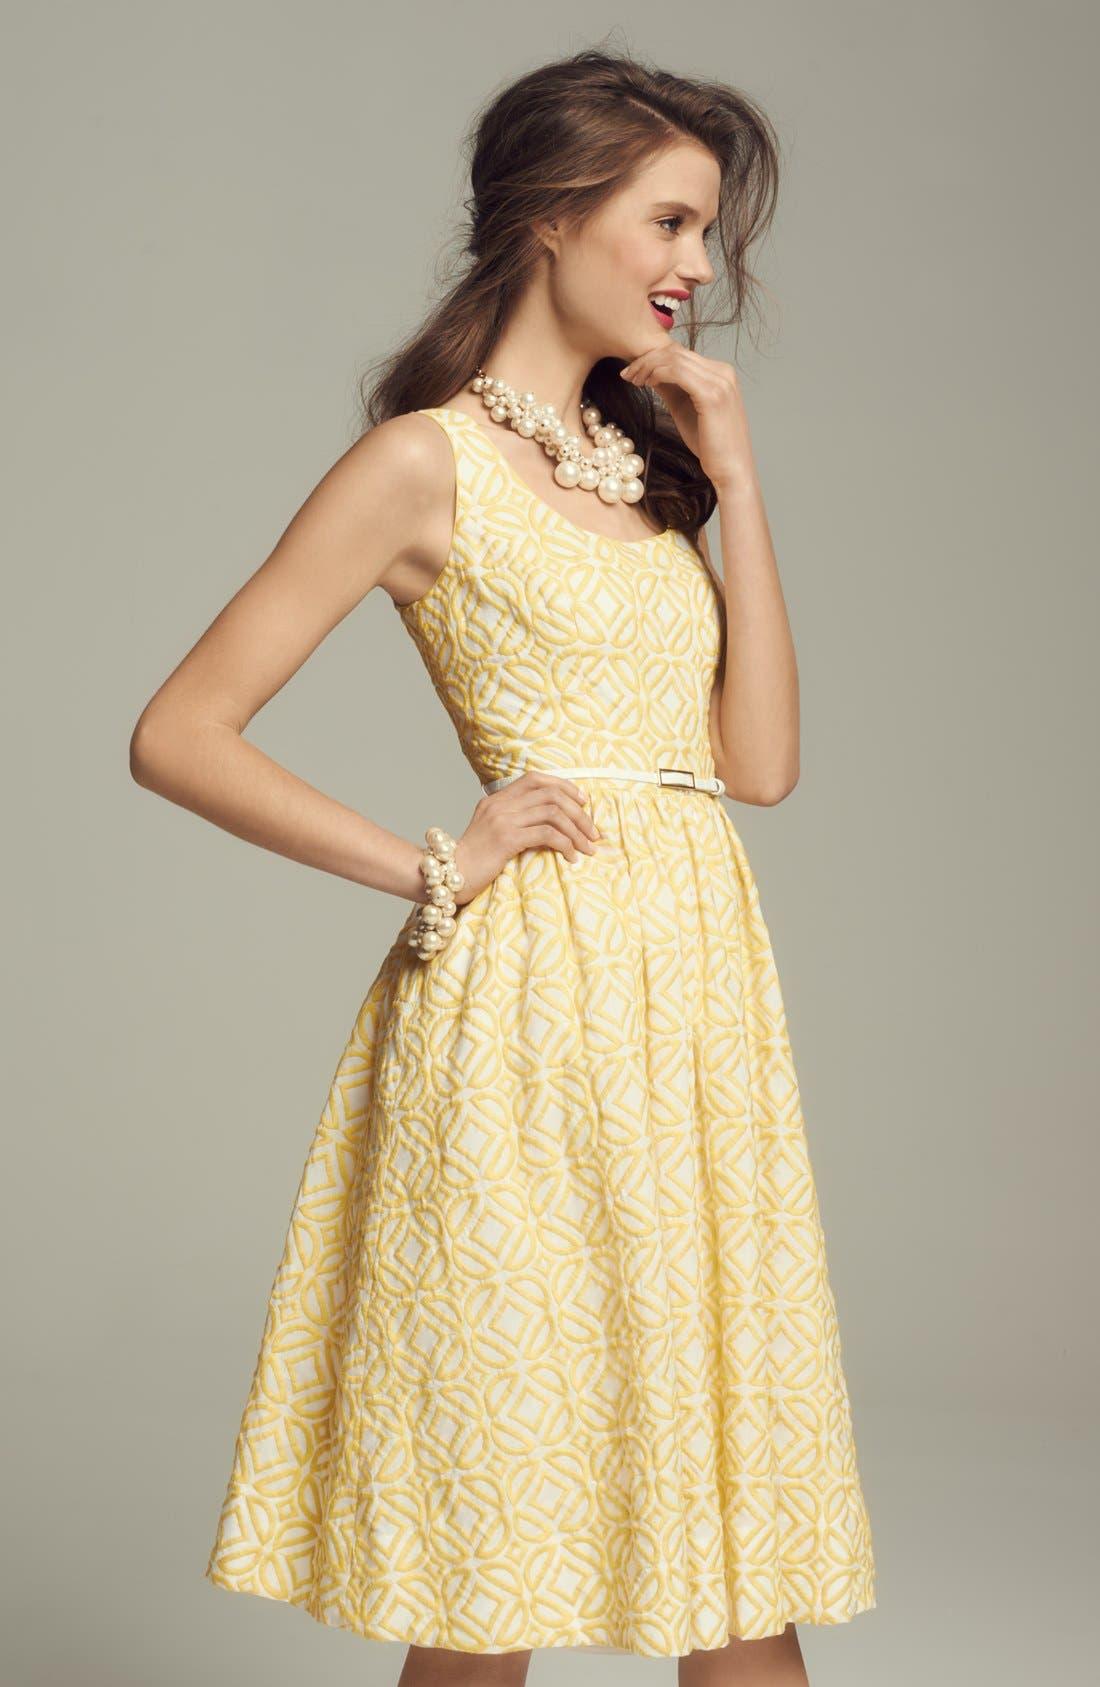 Main Image - Donna Morgan Jacquard Dress & Accessories